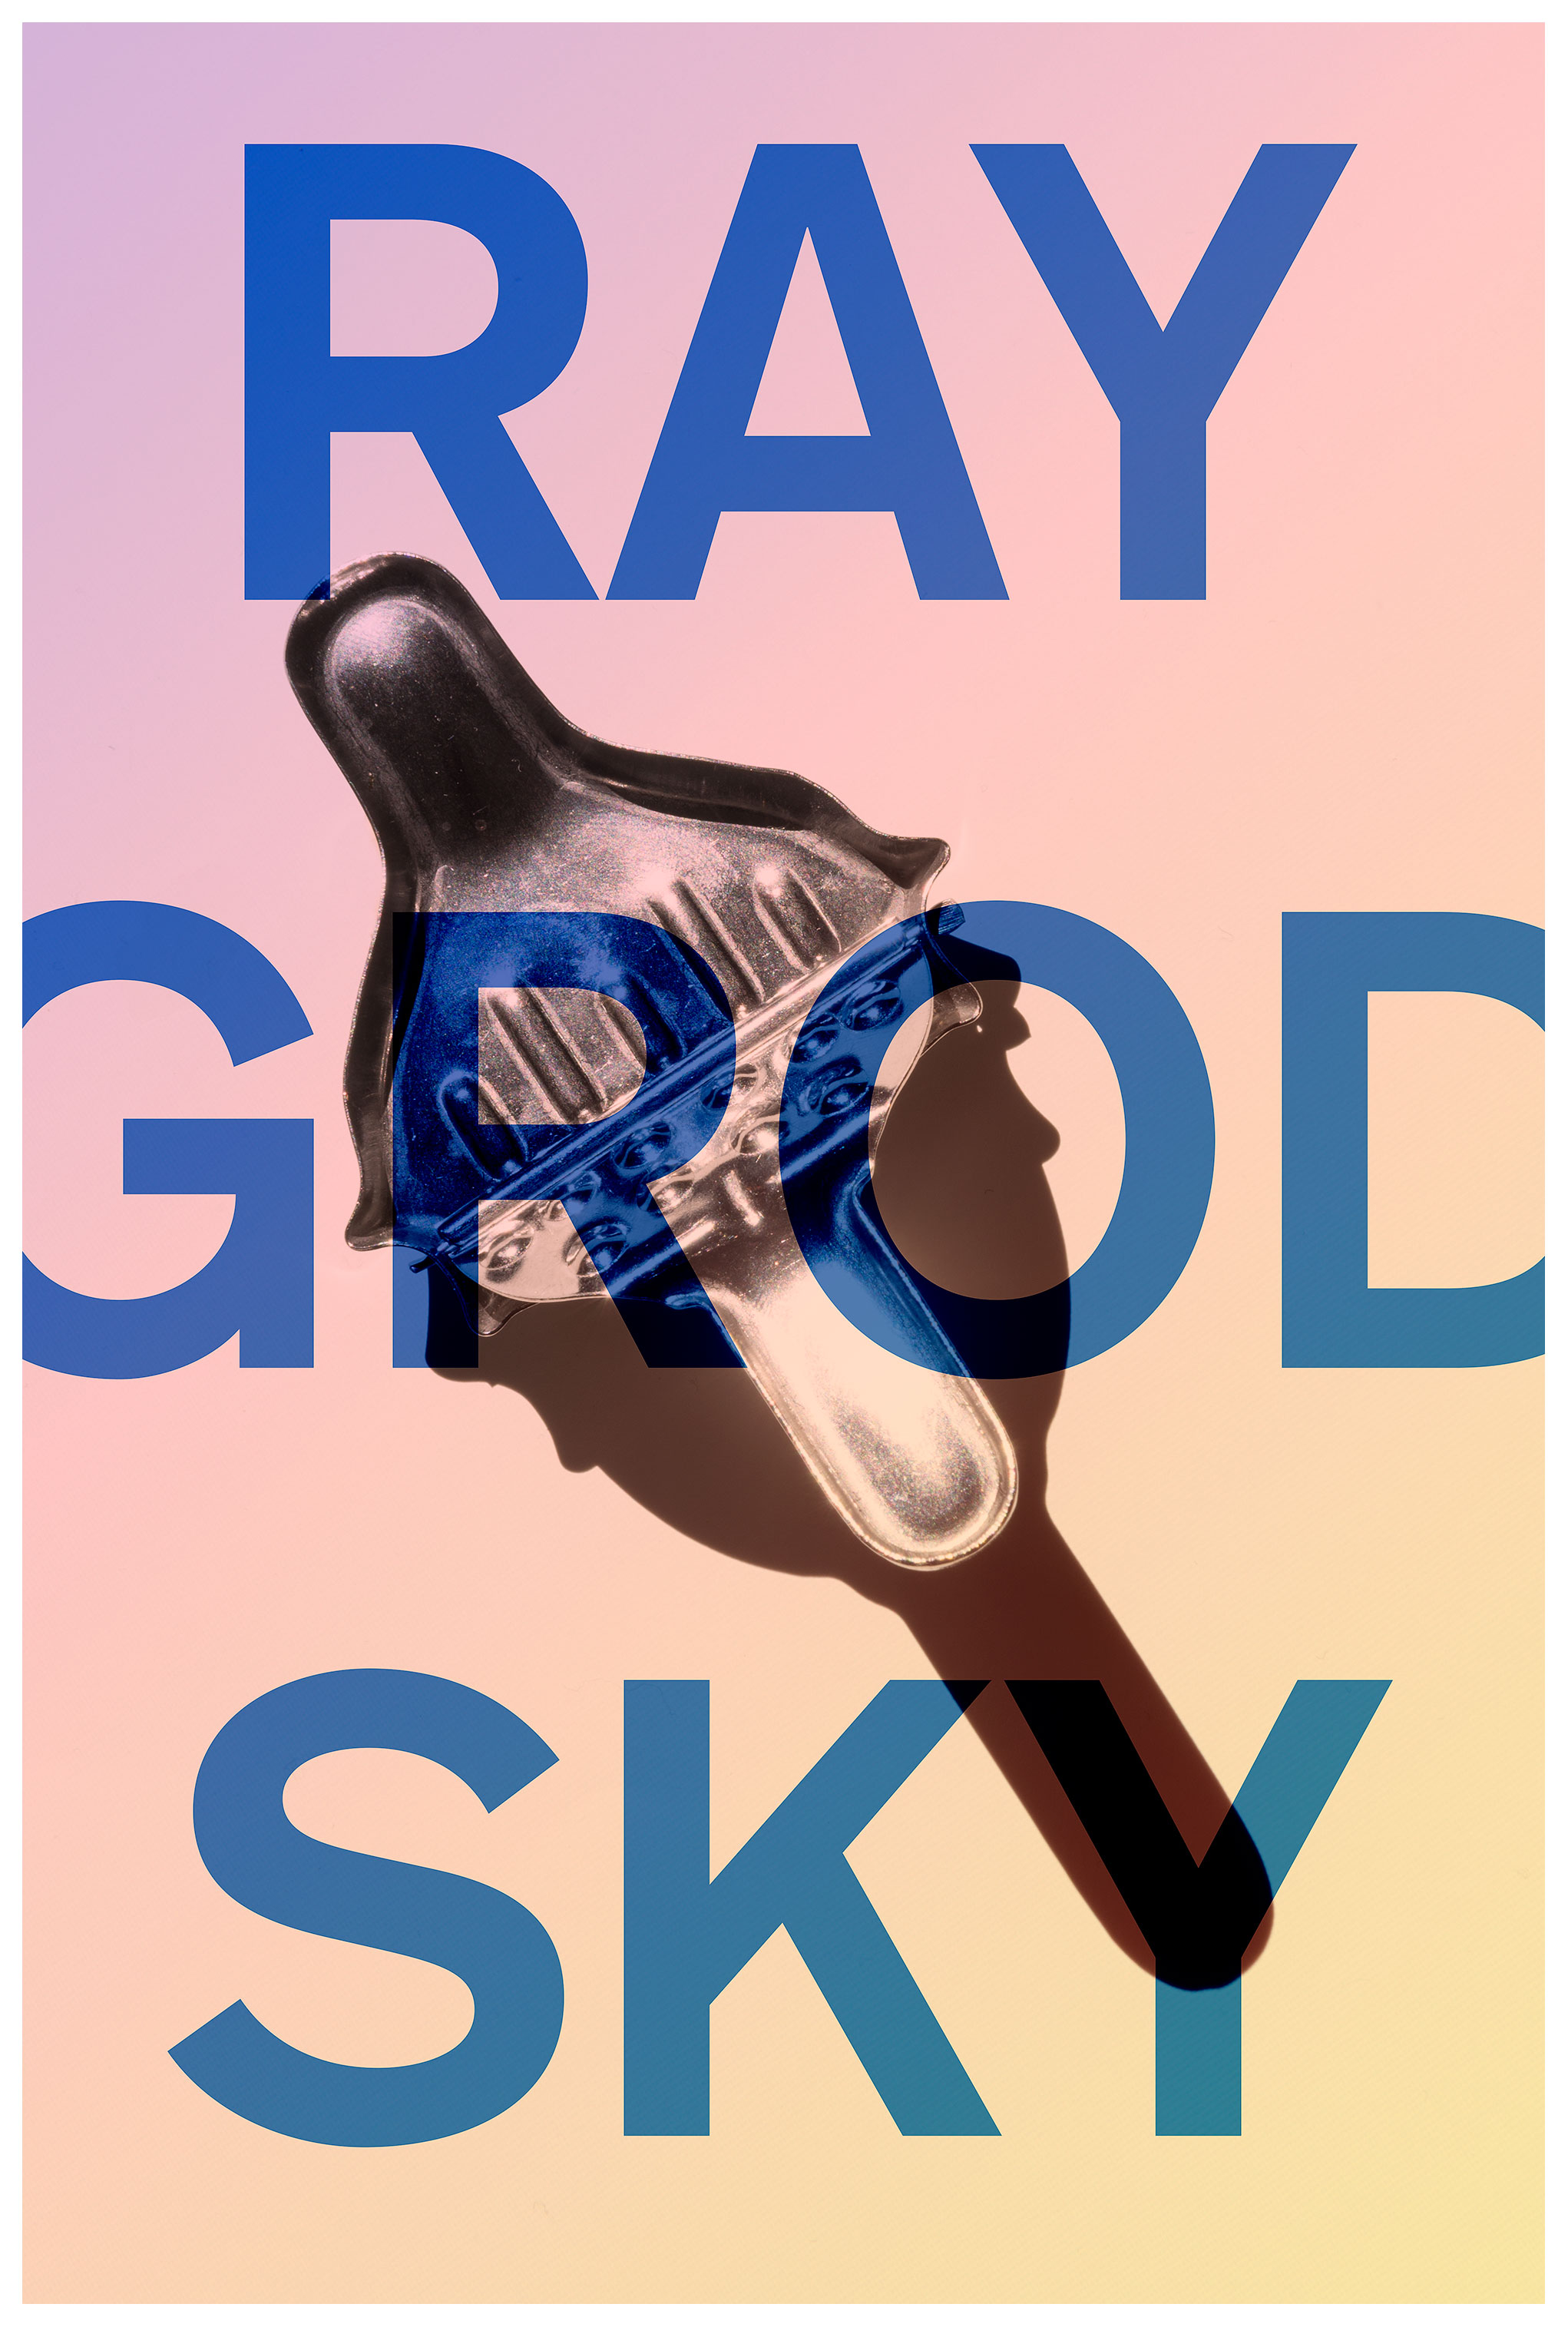 TESTSHOOT-RAYGRODSKY-20171032.jpg